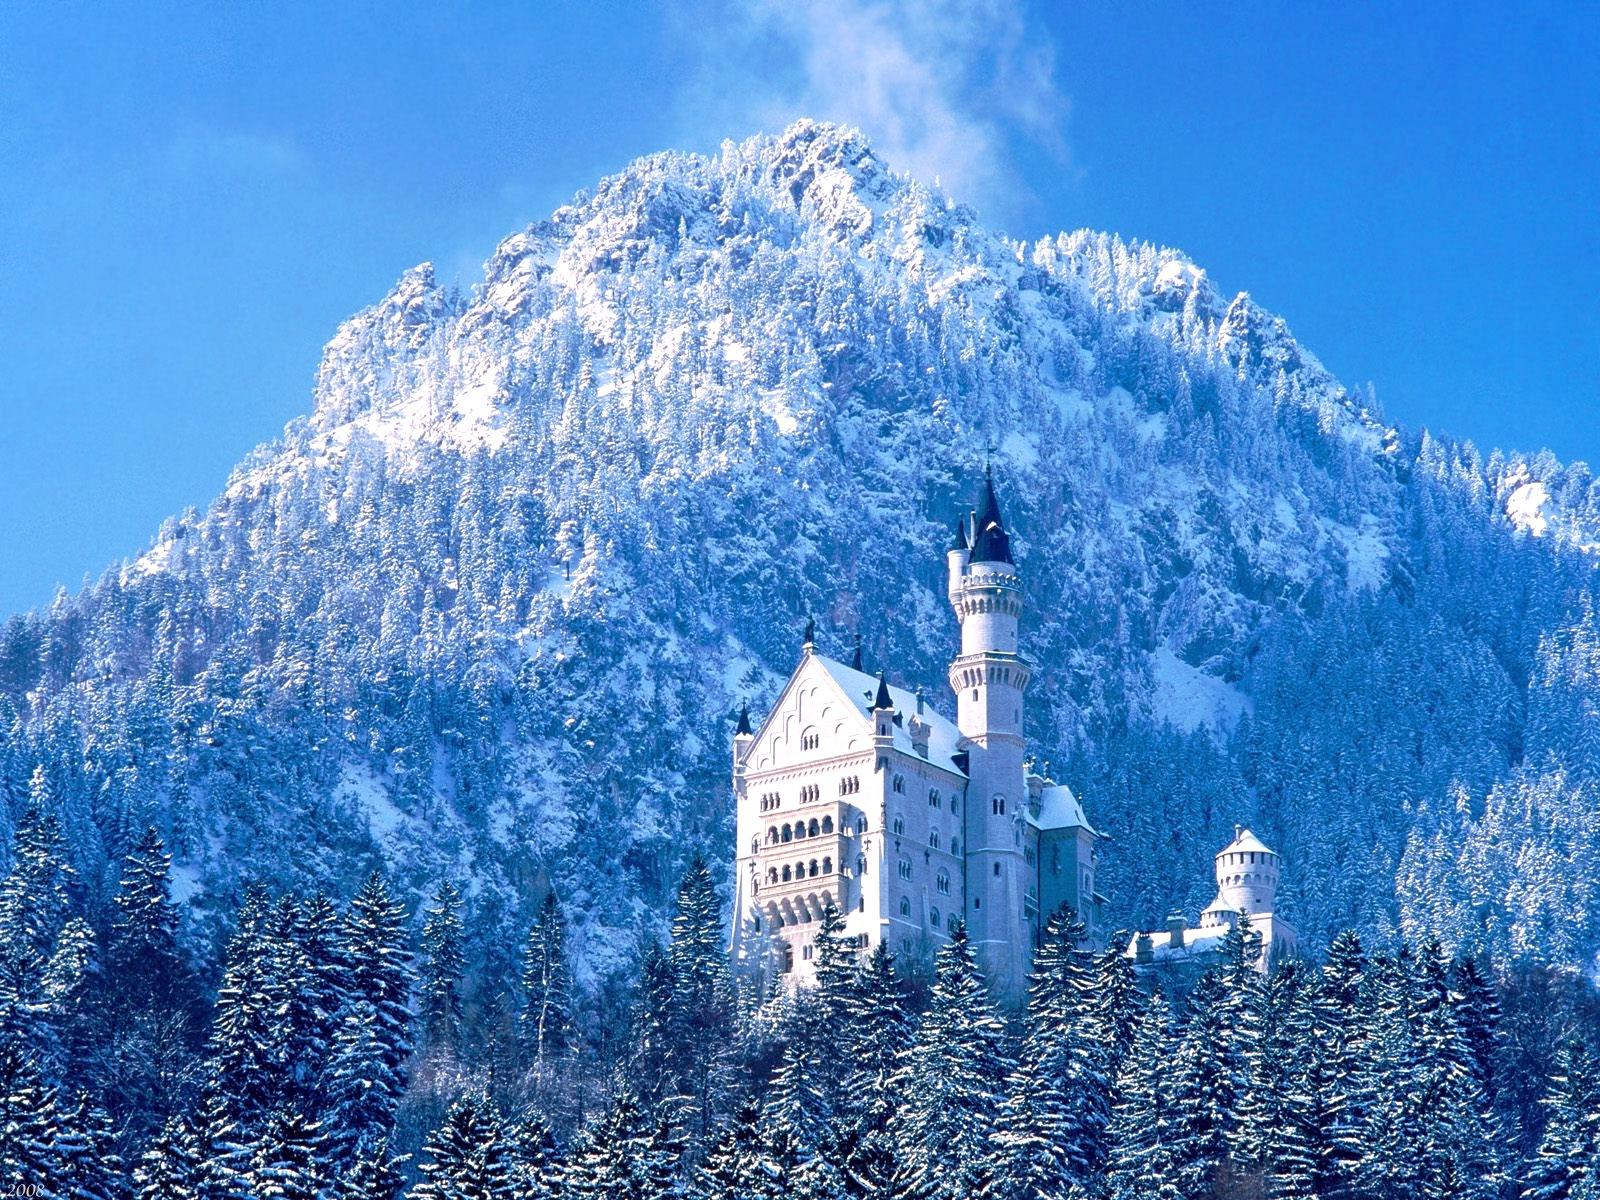 http://3.bp.blogspot.com/-hOZl-zRIlZI/T4UGnELVVVI/AAAAAAAAAhg/7mMJXygFYXg/s1600/winter_season.jpg